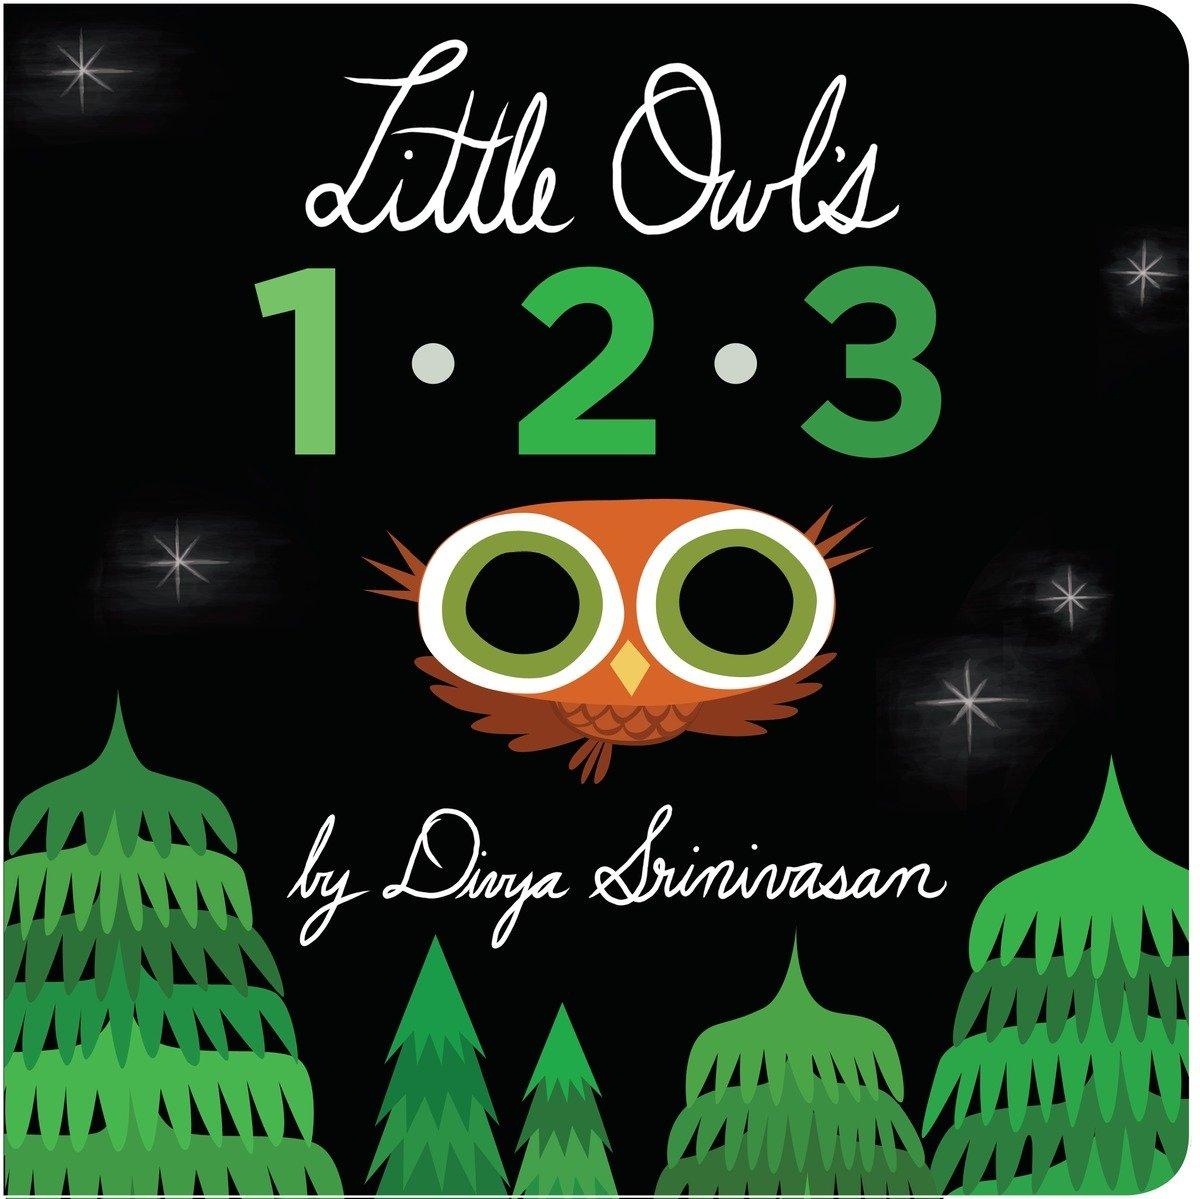 Amazon.com: Little Owl's 1-2-3 (9780451474544): Srinivasan, Divya, Srinivasan, Divya: Books